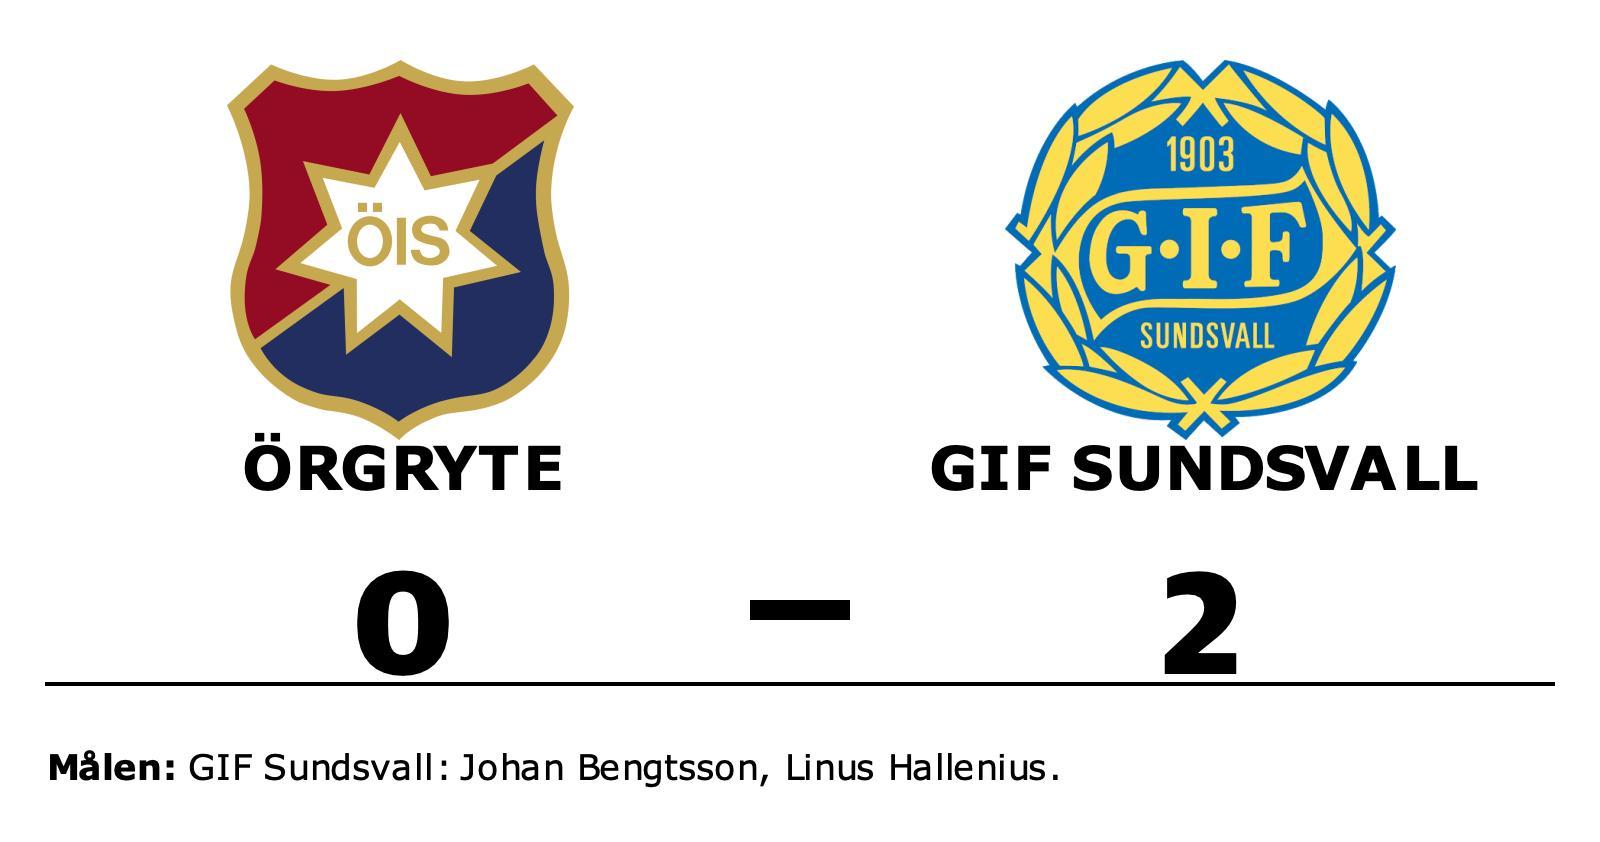 GIF Sundsvall upp i topp efter seger mot Örgryte